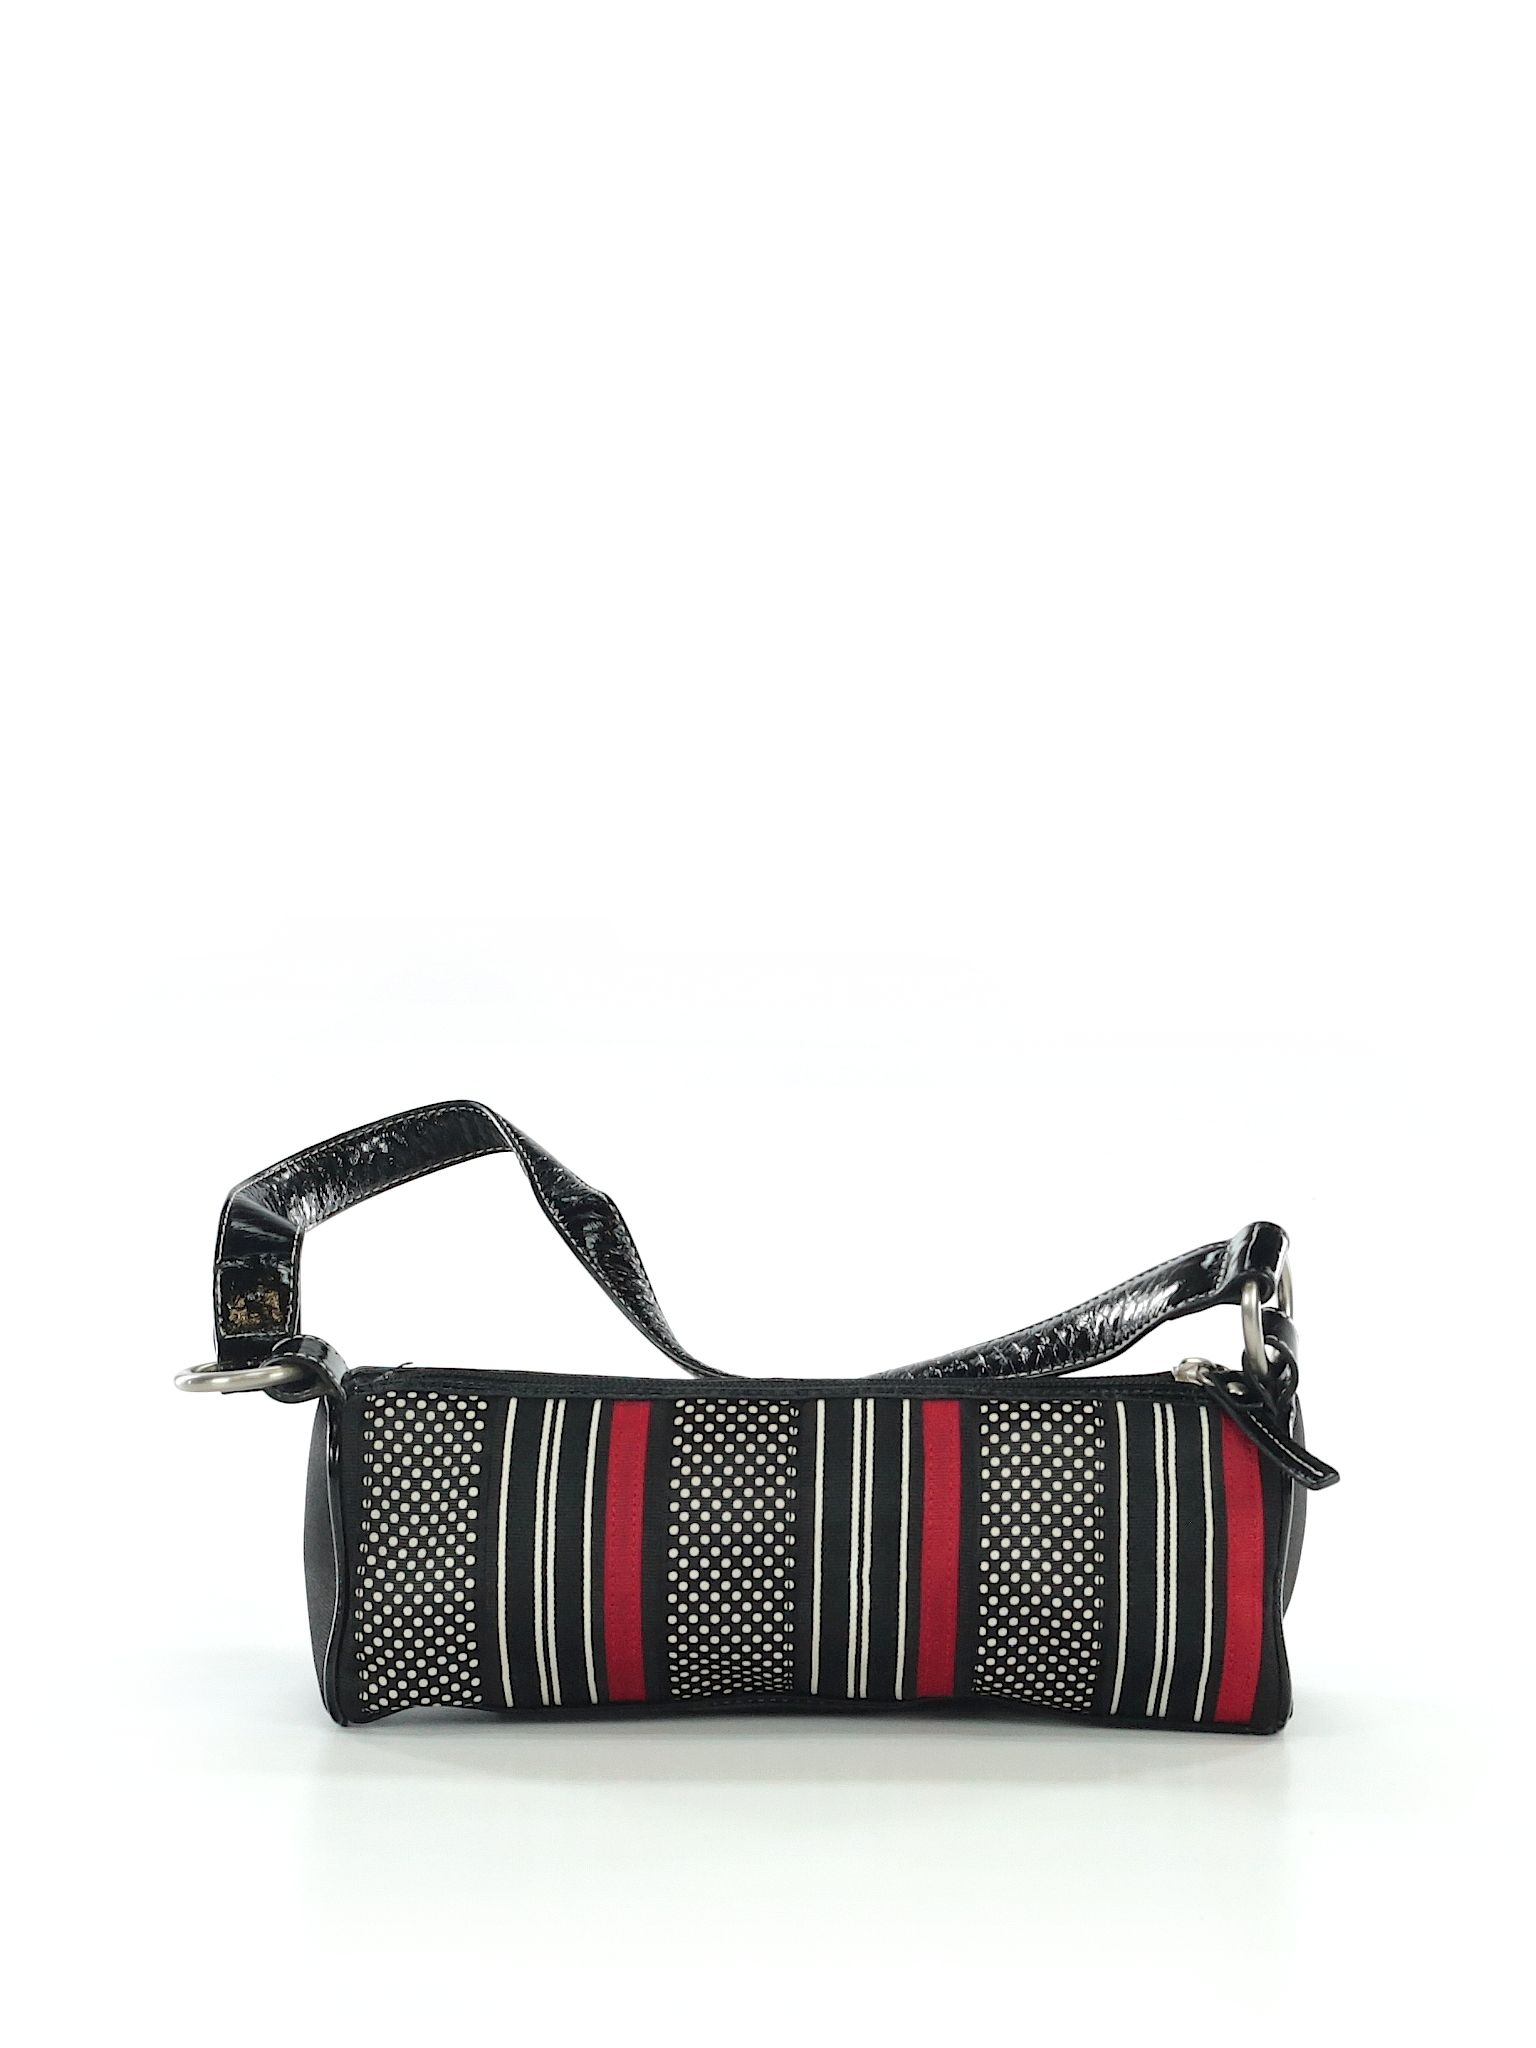 Talbots Shoulder Bag Size Na Black Womens Bags  $4299